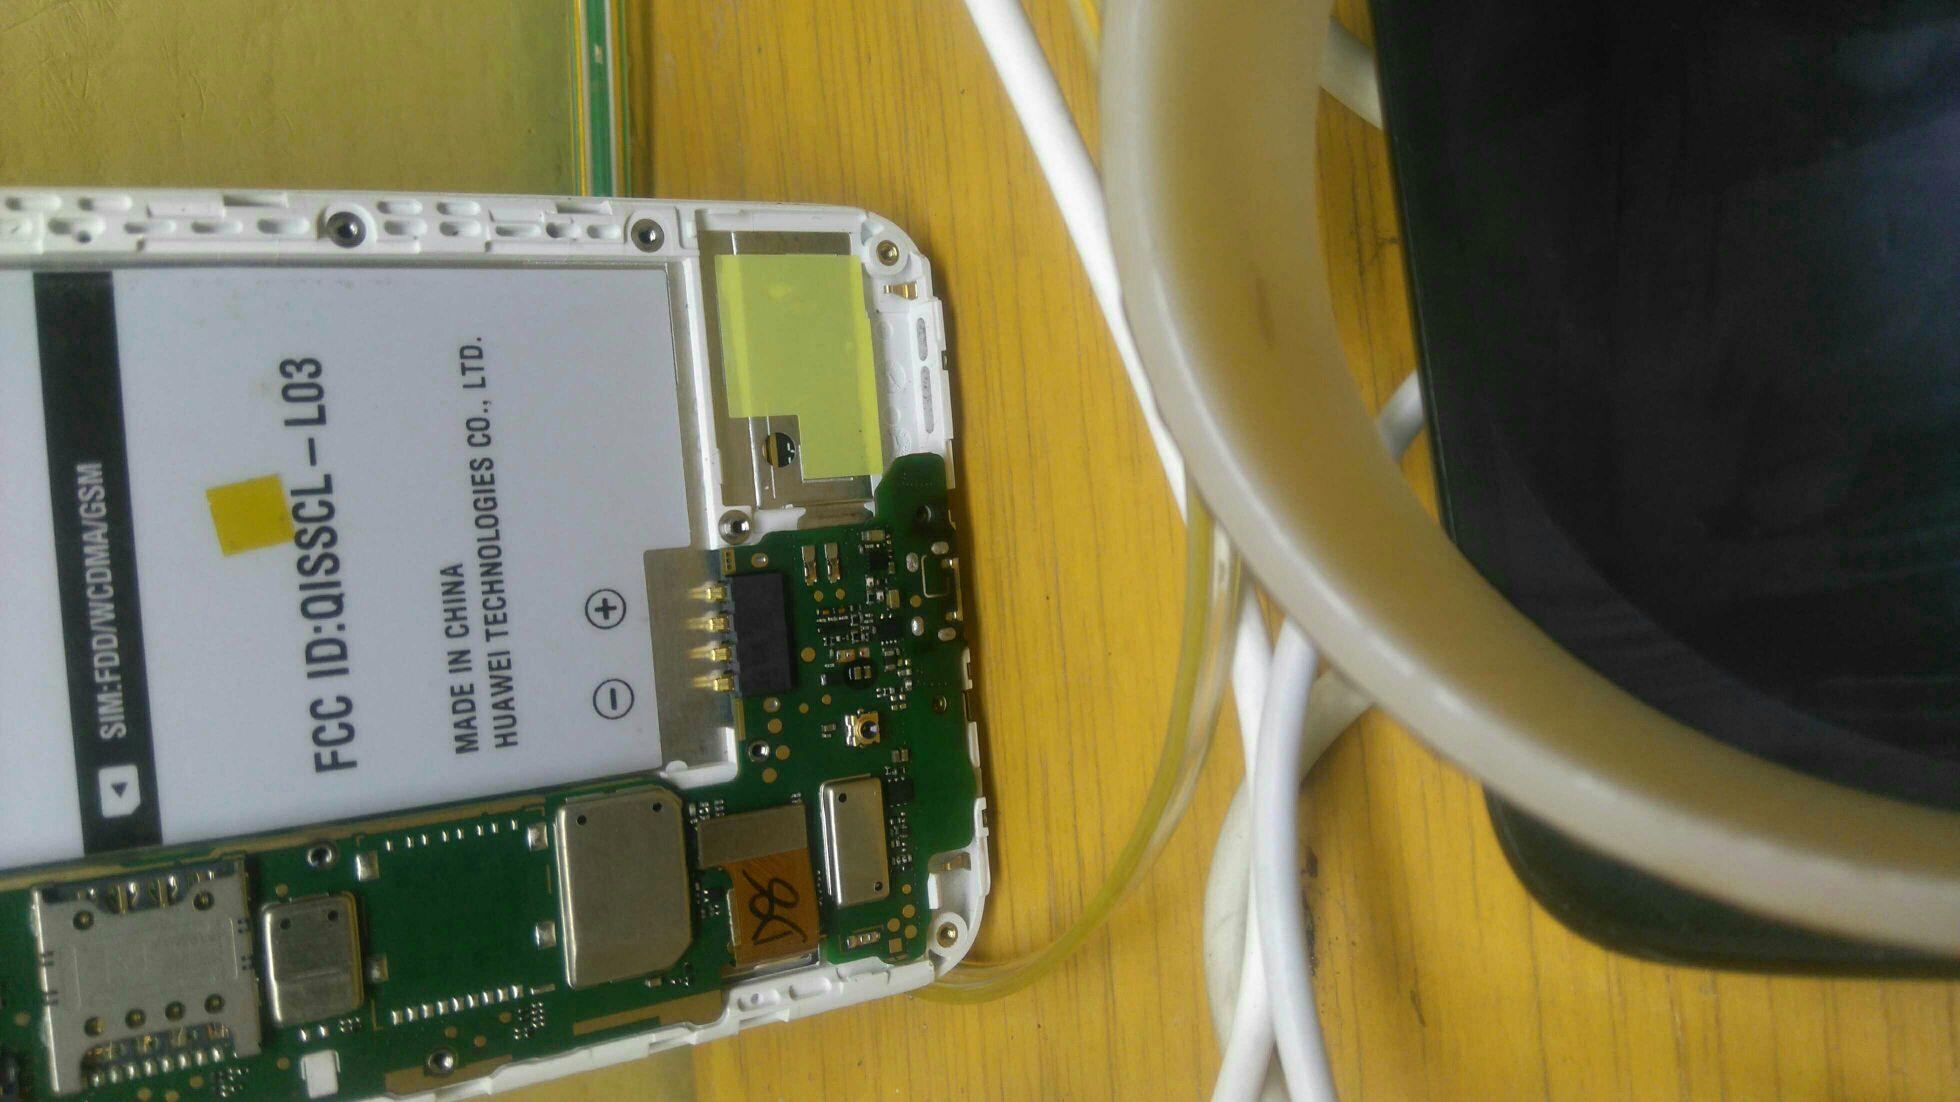 DIAGRAM] Diagrama Huawei Scl L03 FULL Version HD Quality Scl L03